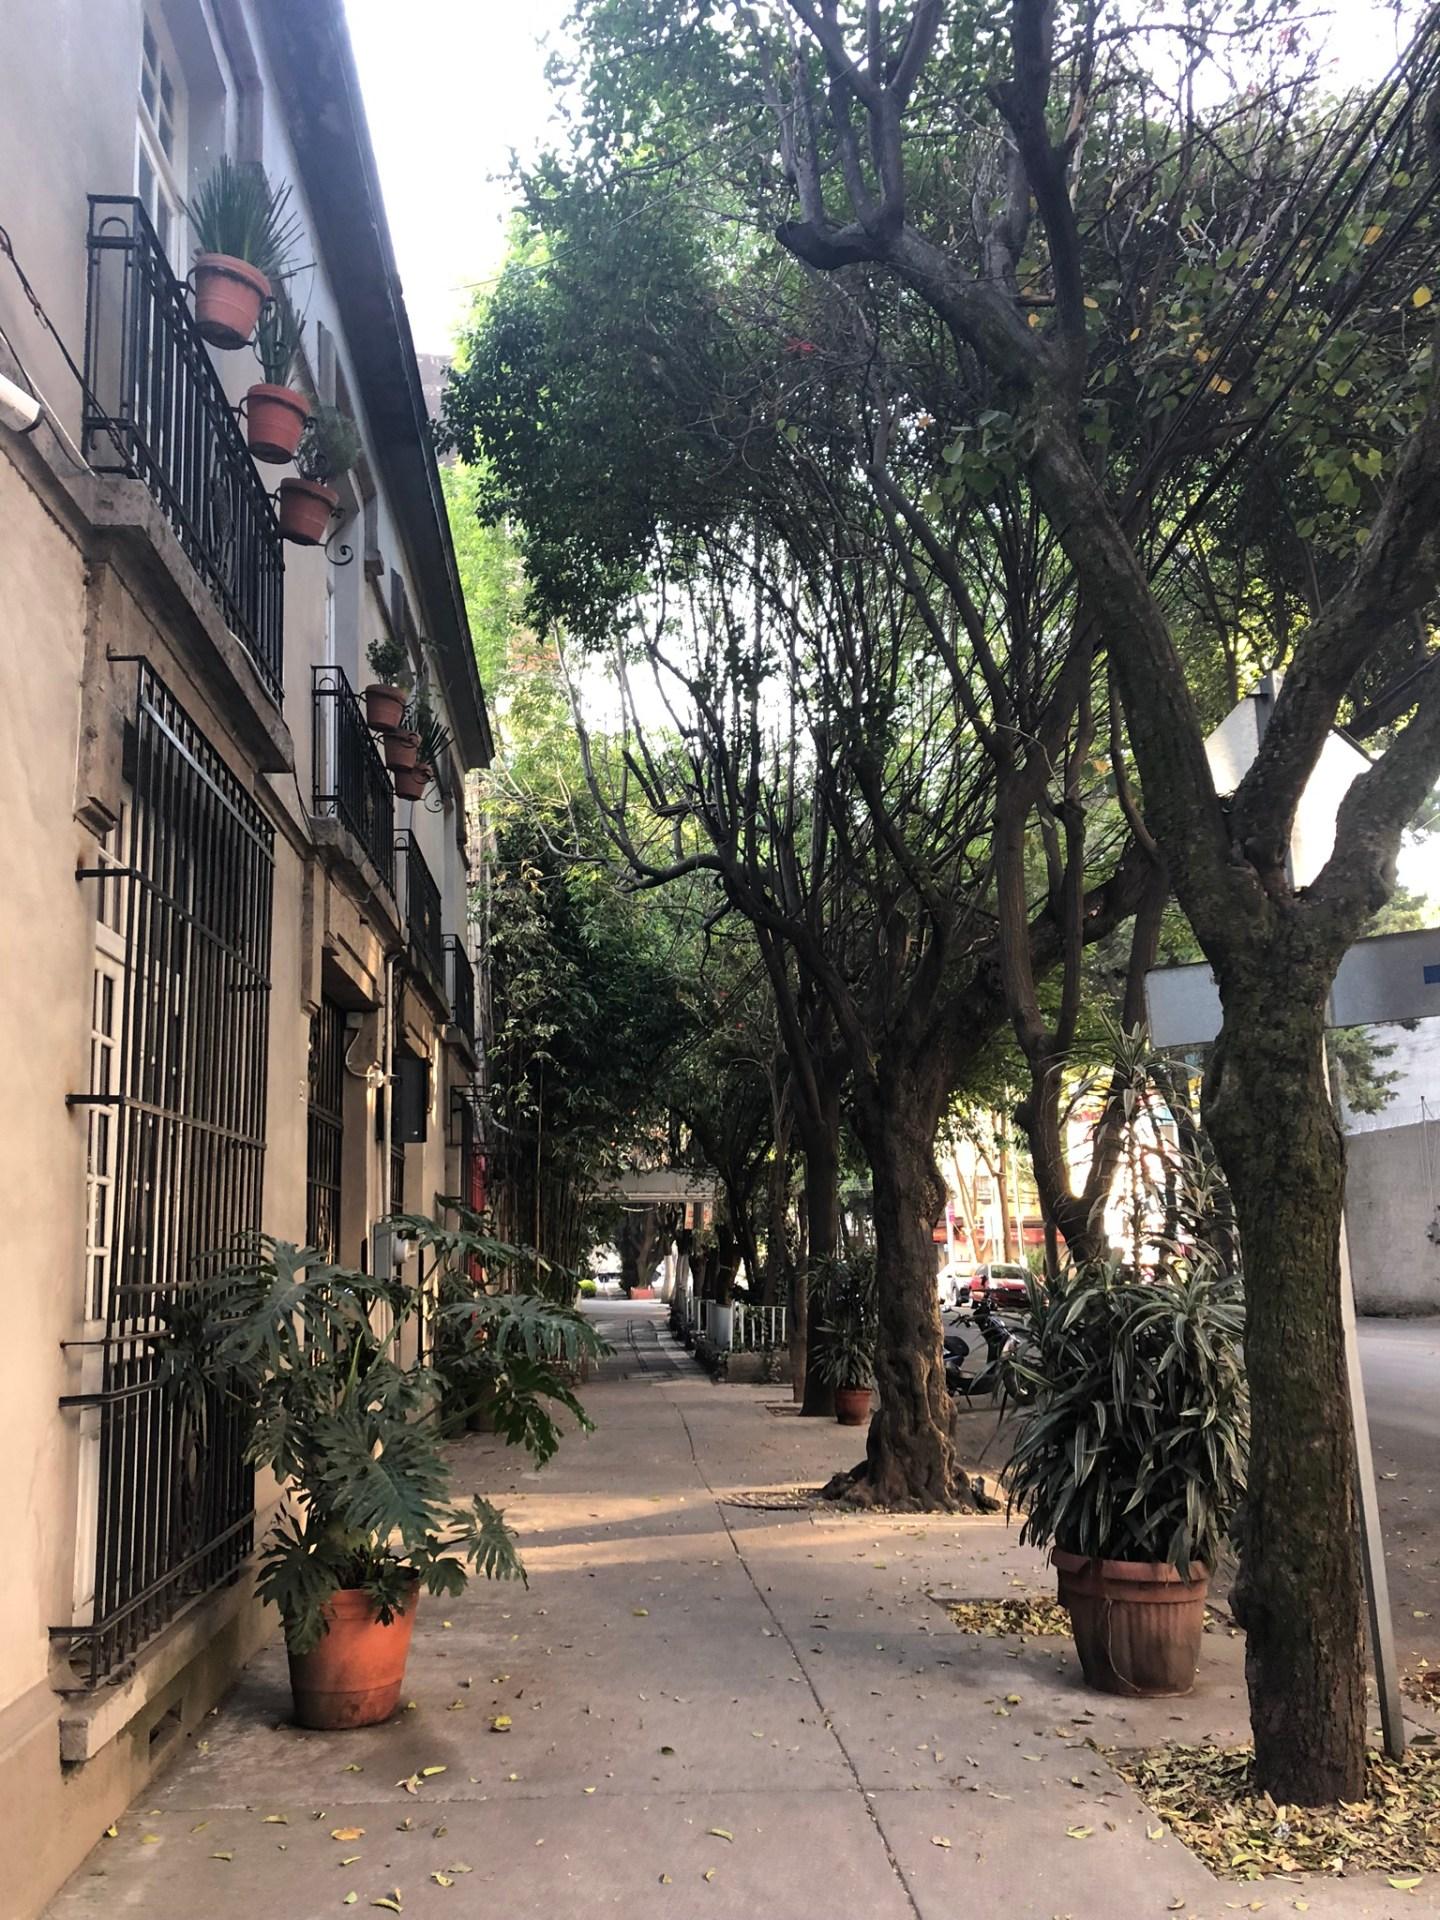 Streets of Condesa, Mexico City